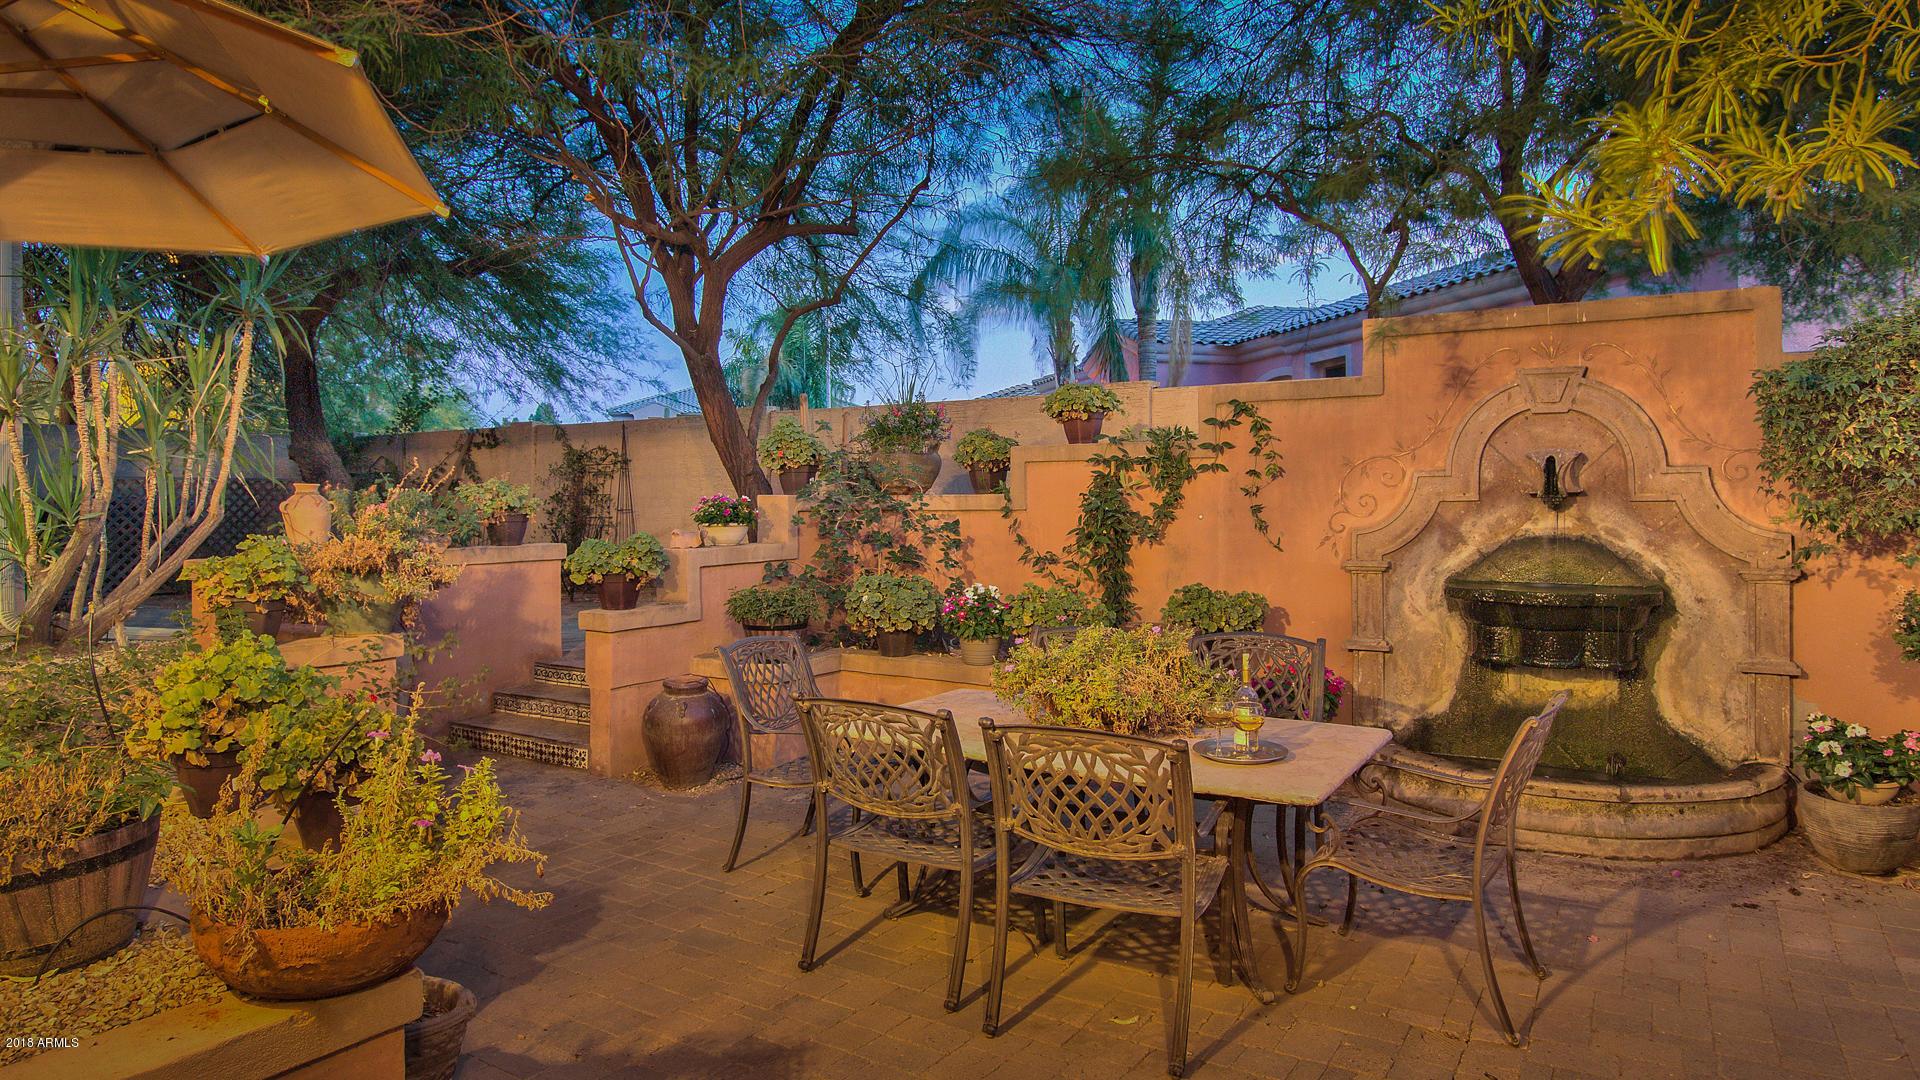 MLS 5796203 2830 E Bridgeport Court, Gilbert, AZ 85295 4 Bedroom Homes